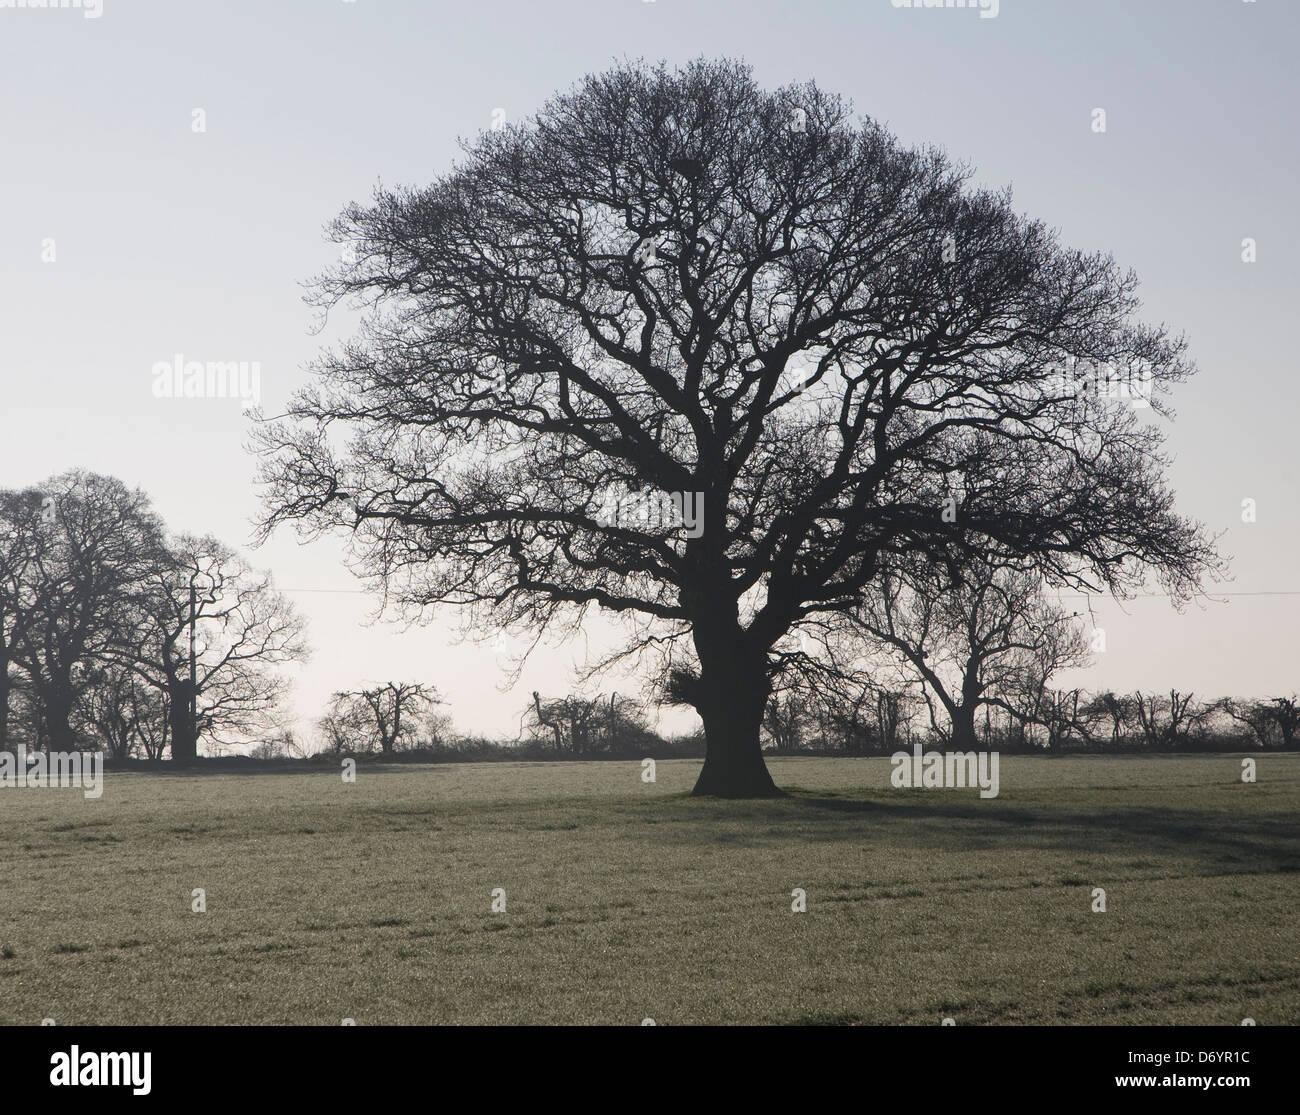 Outline of leafless oak tree standing in field alone, Sutton, Suffolk, England - Stock Image